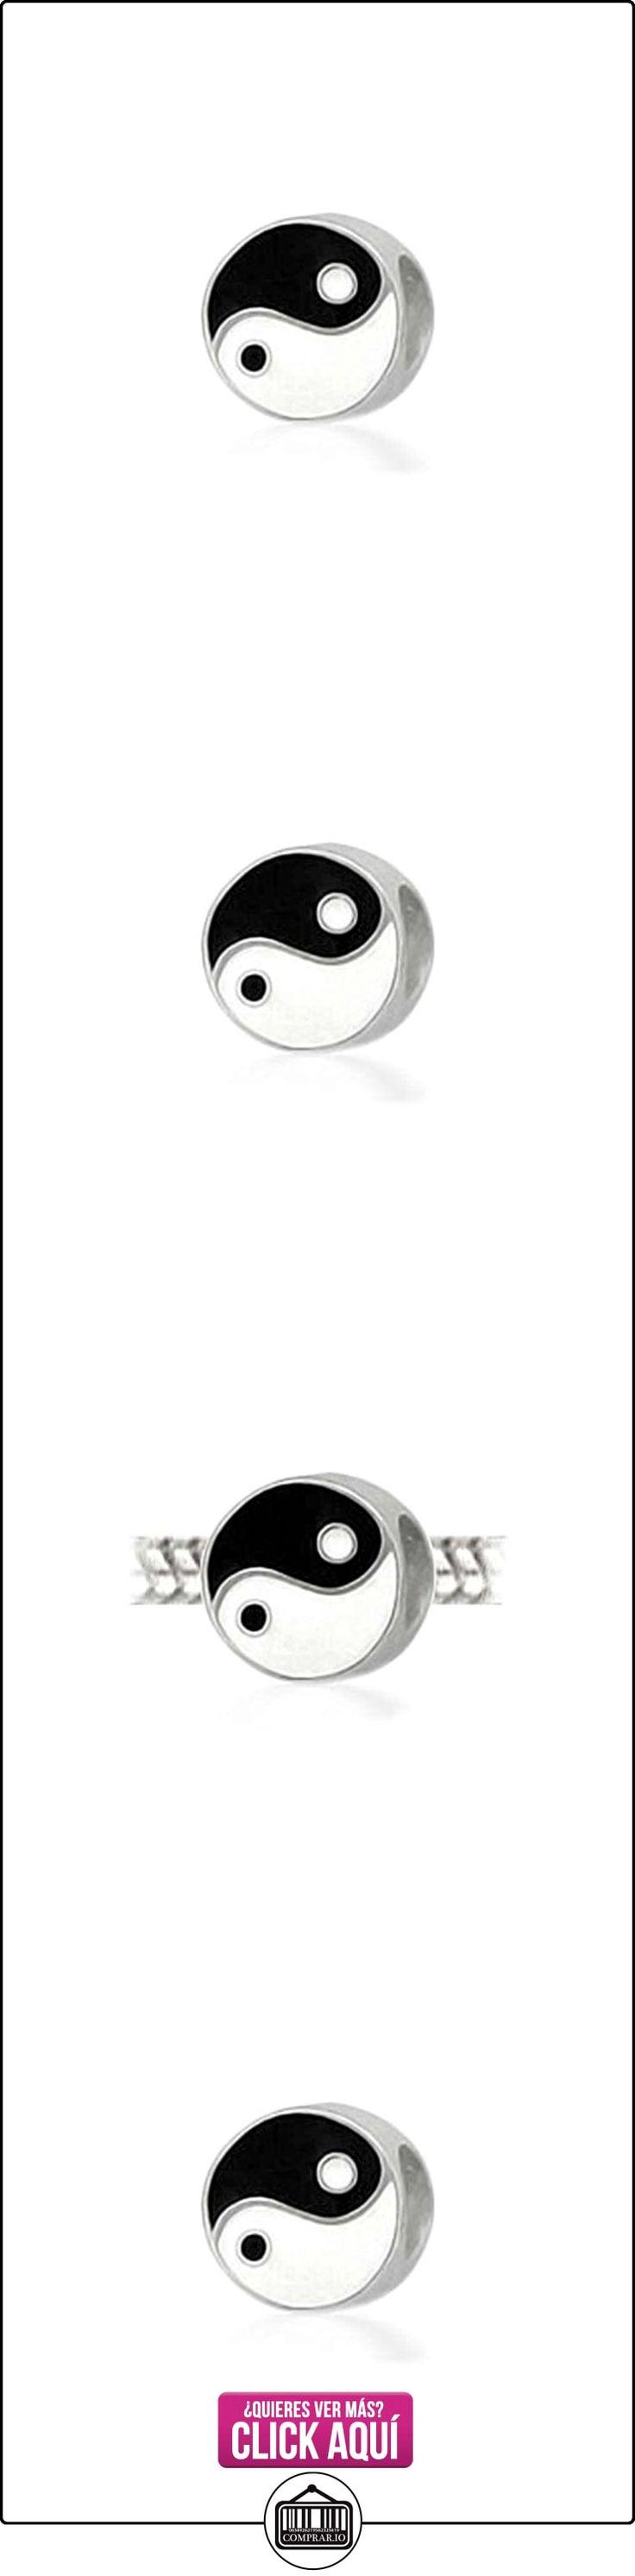 Bling Jewelry Yin Yang 925 Plata Inpirador Abalorio  ✿ Joyas para mujer - Las mejores ofertas ✿ ▬► Ver oferta: http://comprar.io/goto/B0045F3SIW